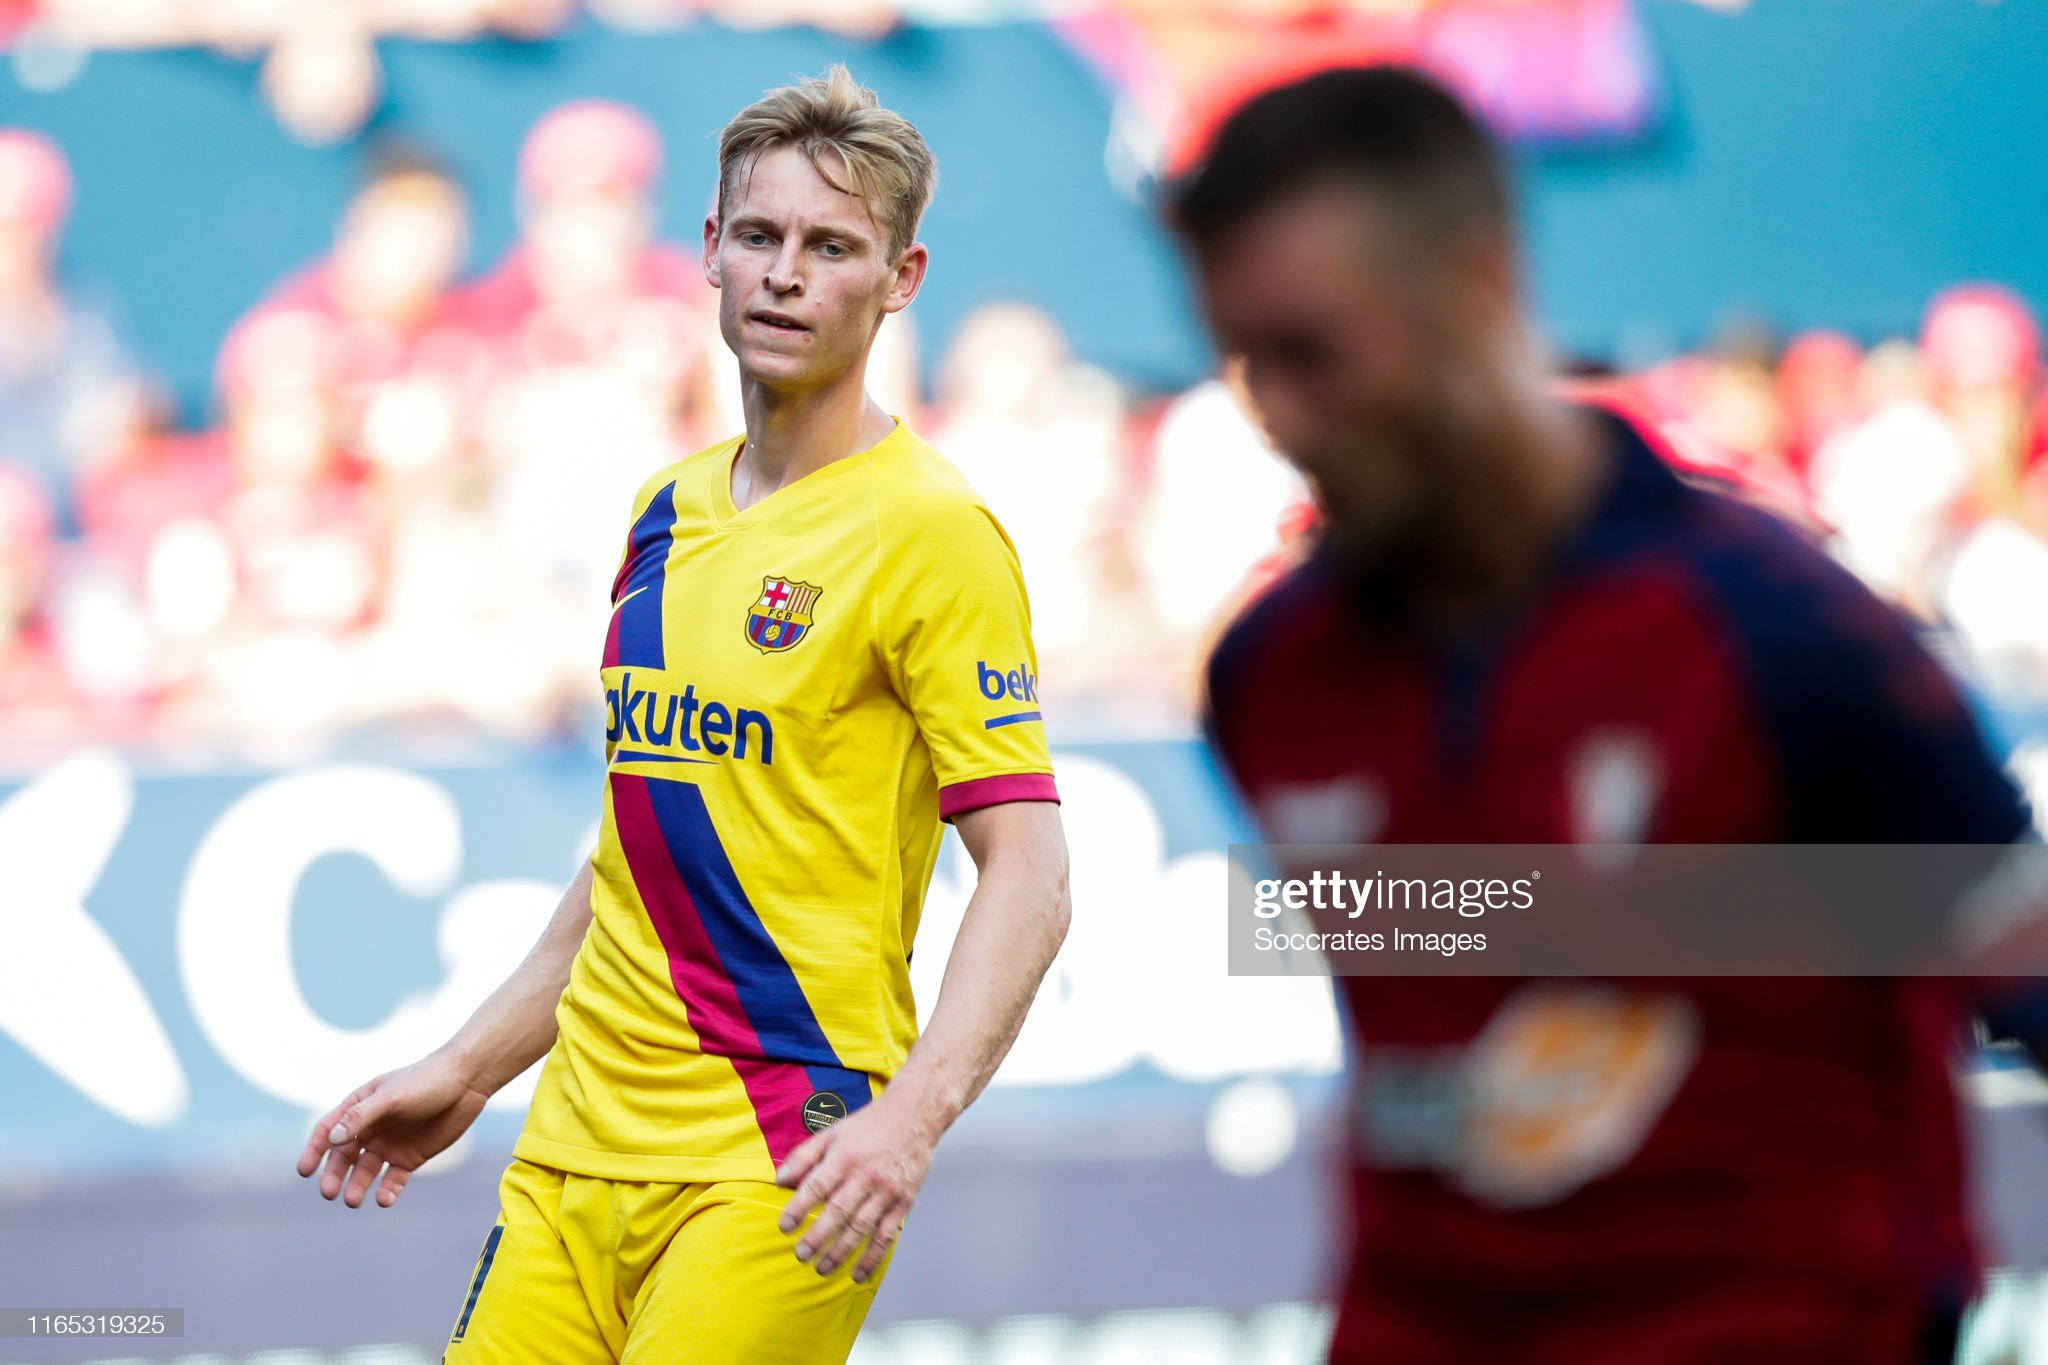 صور مباراة : أوساسونا - برشلونة 2-2 ( 31-08-2019 )  Frenkie-de-jong-of-fc-barcelona-during-the-la-liga-santander-match-picture-id1165319325?s=2048x2048